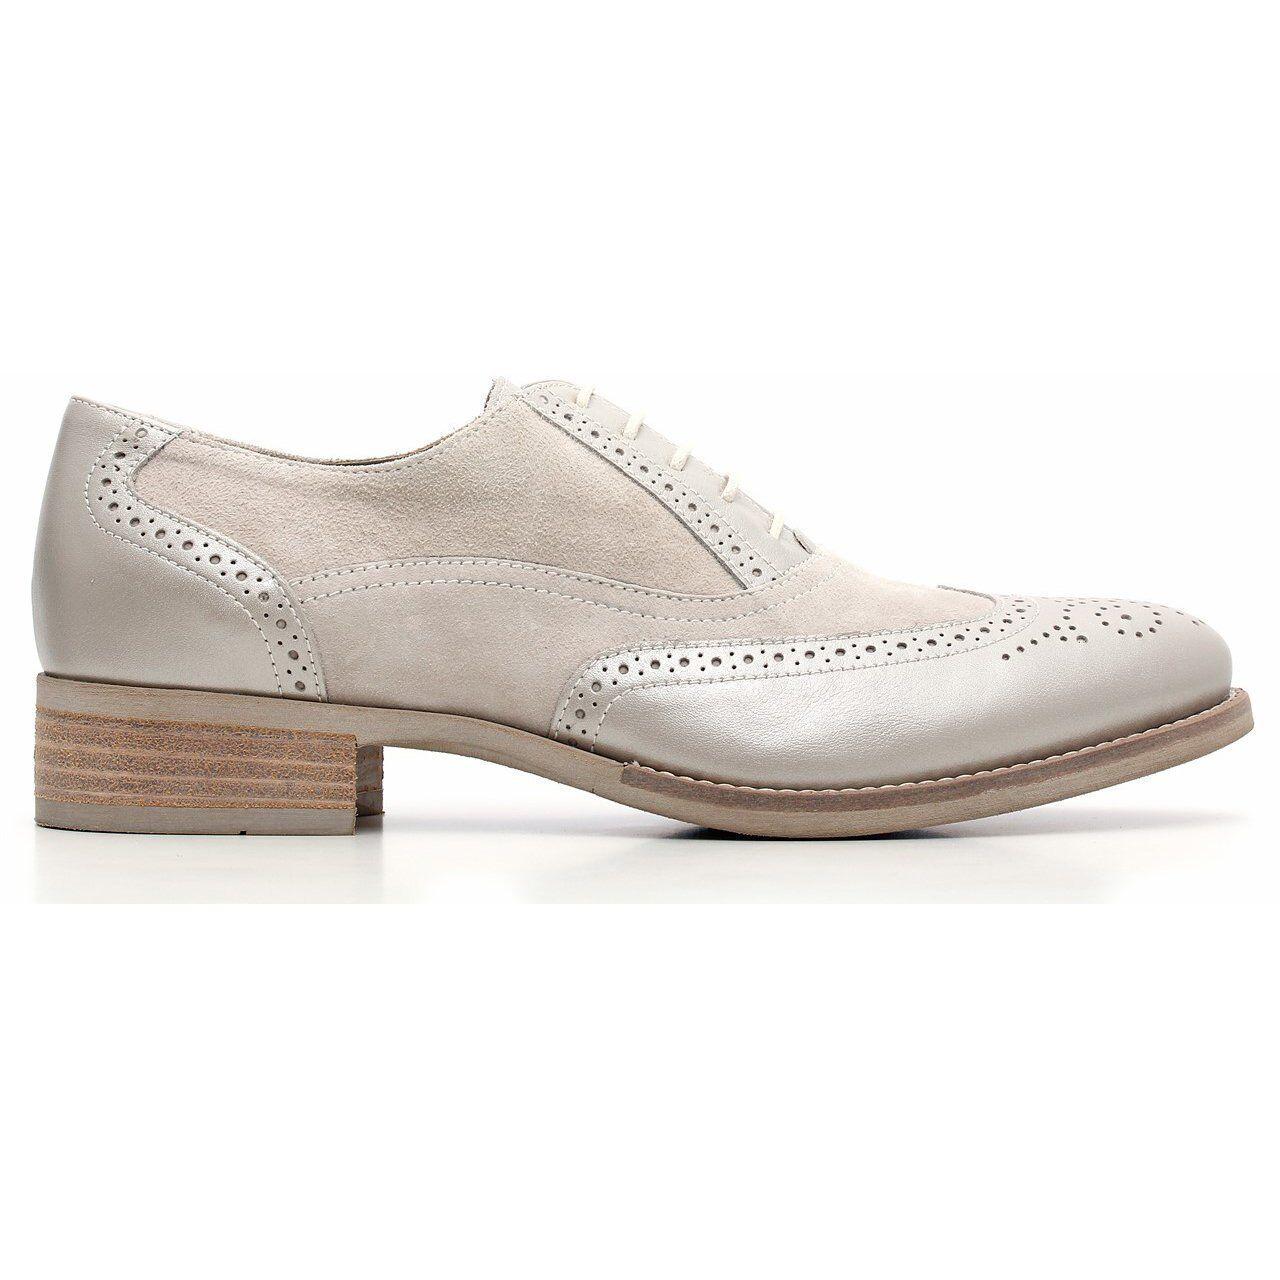 SCONTO 30 % zapatos INGLESE negro GIARDINI mujer SUMMER SUMMER SUMMER SAVANA ART. 615052 61b81c